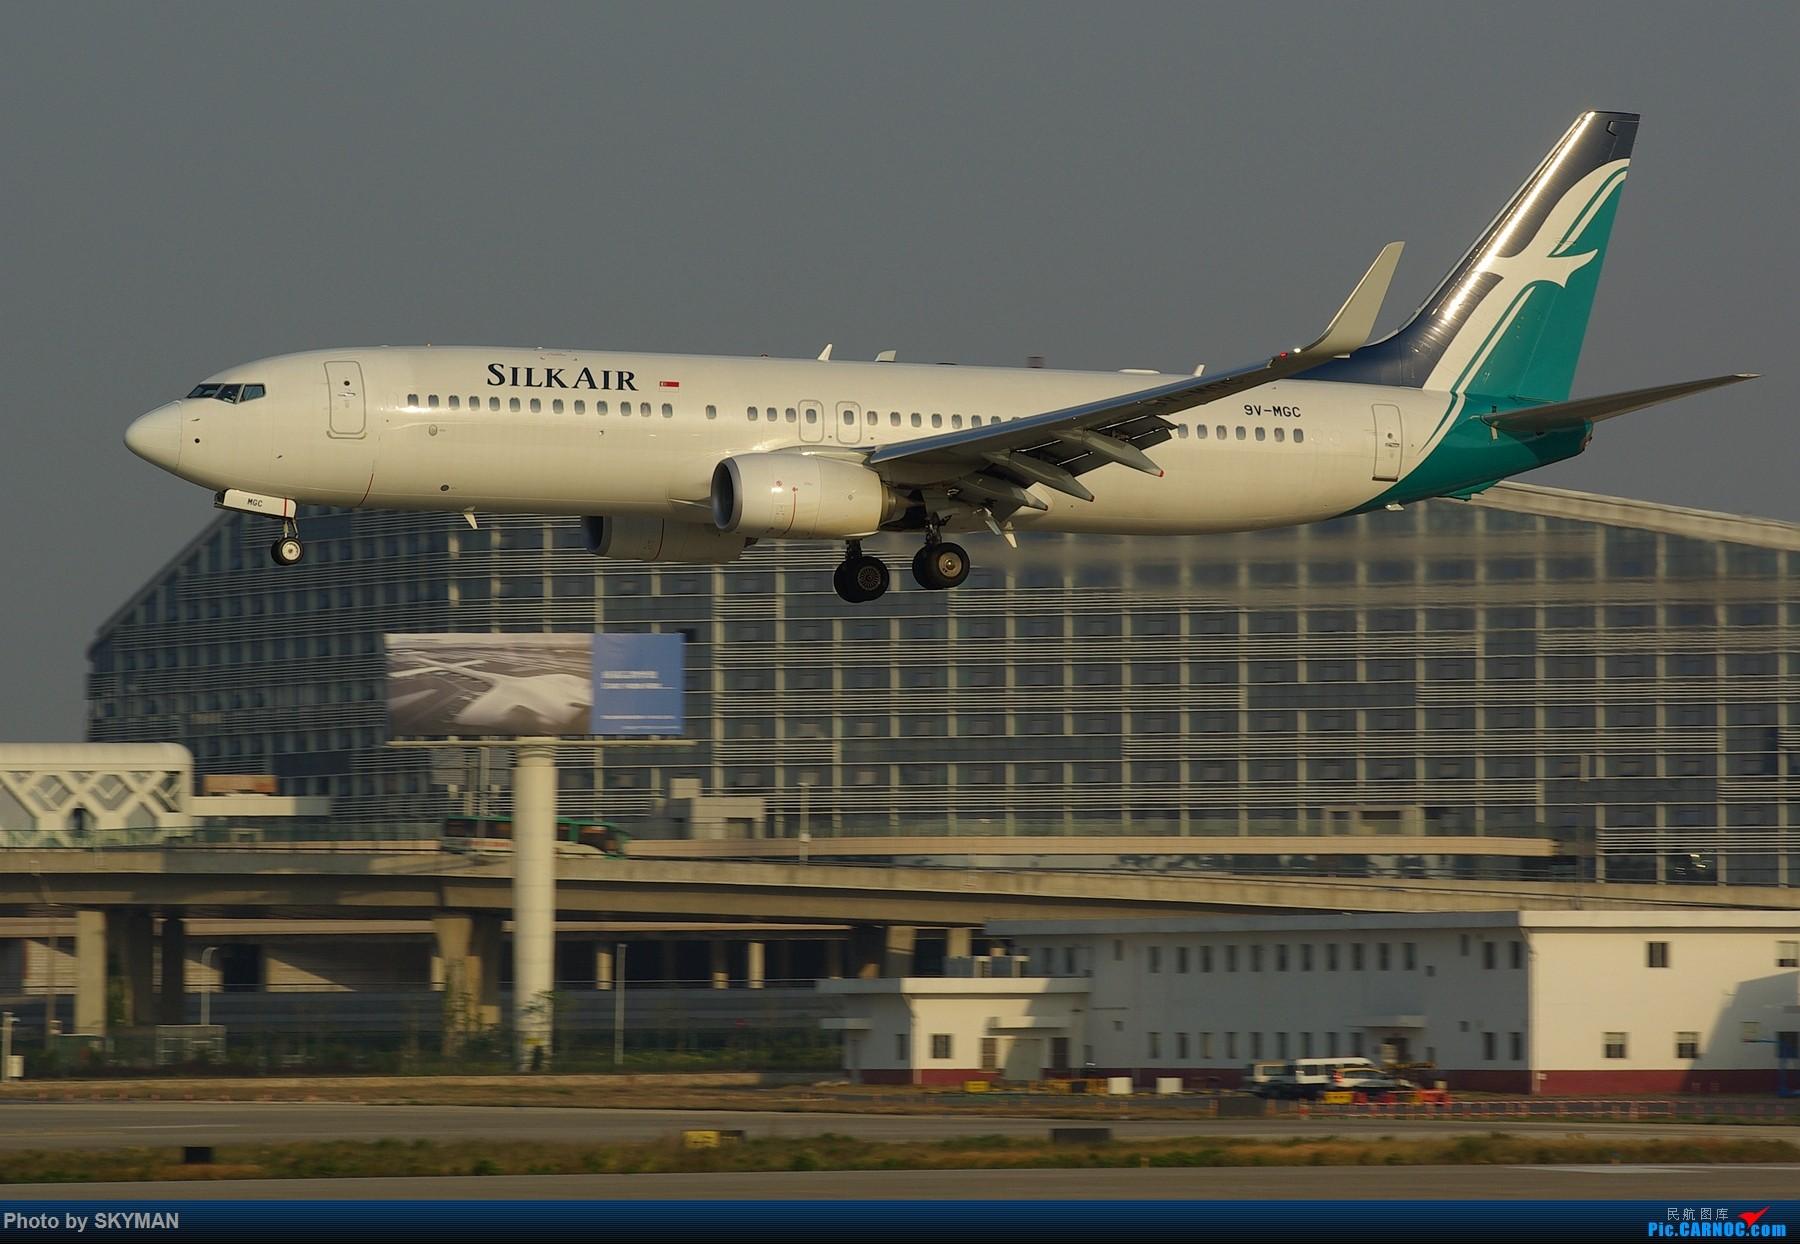 Re:[原创]BLDDQ---内痕么 以目前的形式靠打工实在是揭不开锅了 各位爷列为亲看着意思点啊 别控制 可是今天下午刚出炉的 绝对新鲜热乎 BOEING 737-800 9V-MGC 中国深圳宝安国际机场